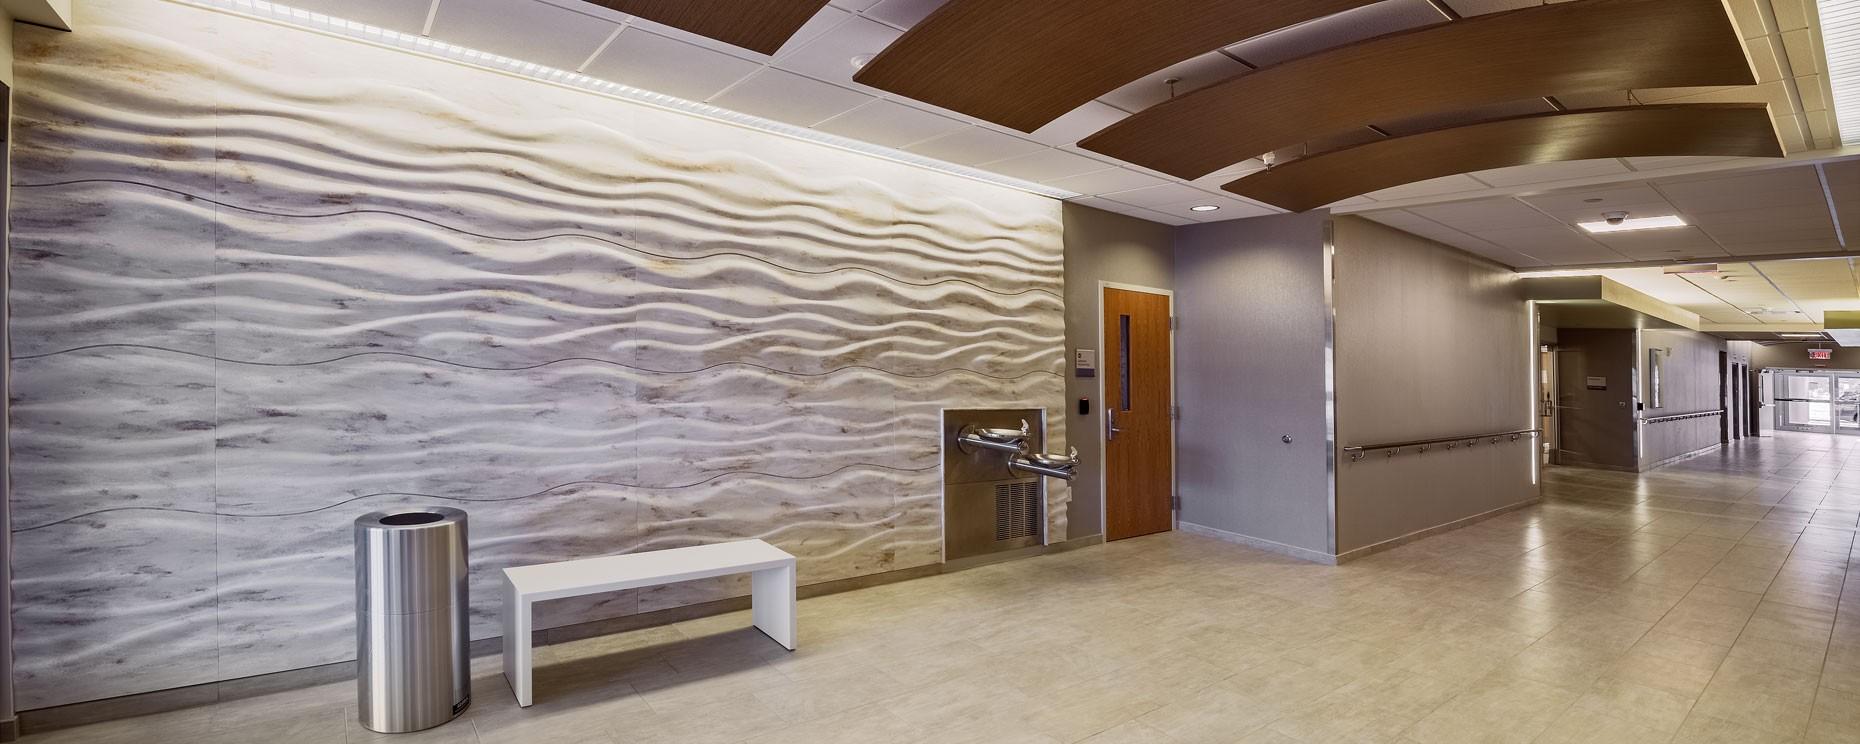 Susquehanna Health, Williamsport, PA. SCULPTCOR ® textured surfaces panels  Material: Corian Architecture: Burkavage Design Associates Product Design: ASST Design Team